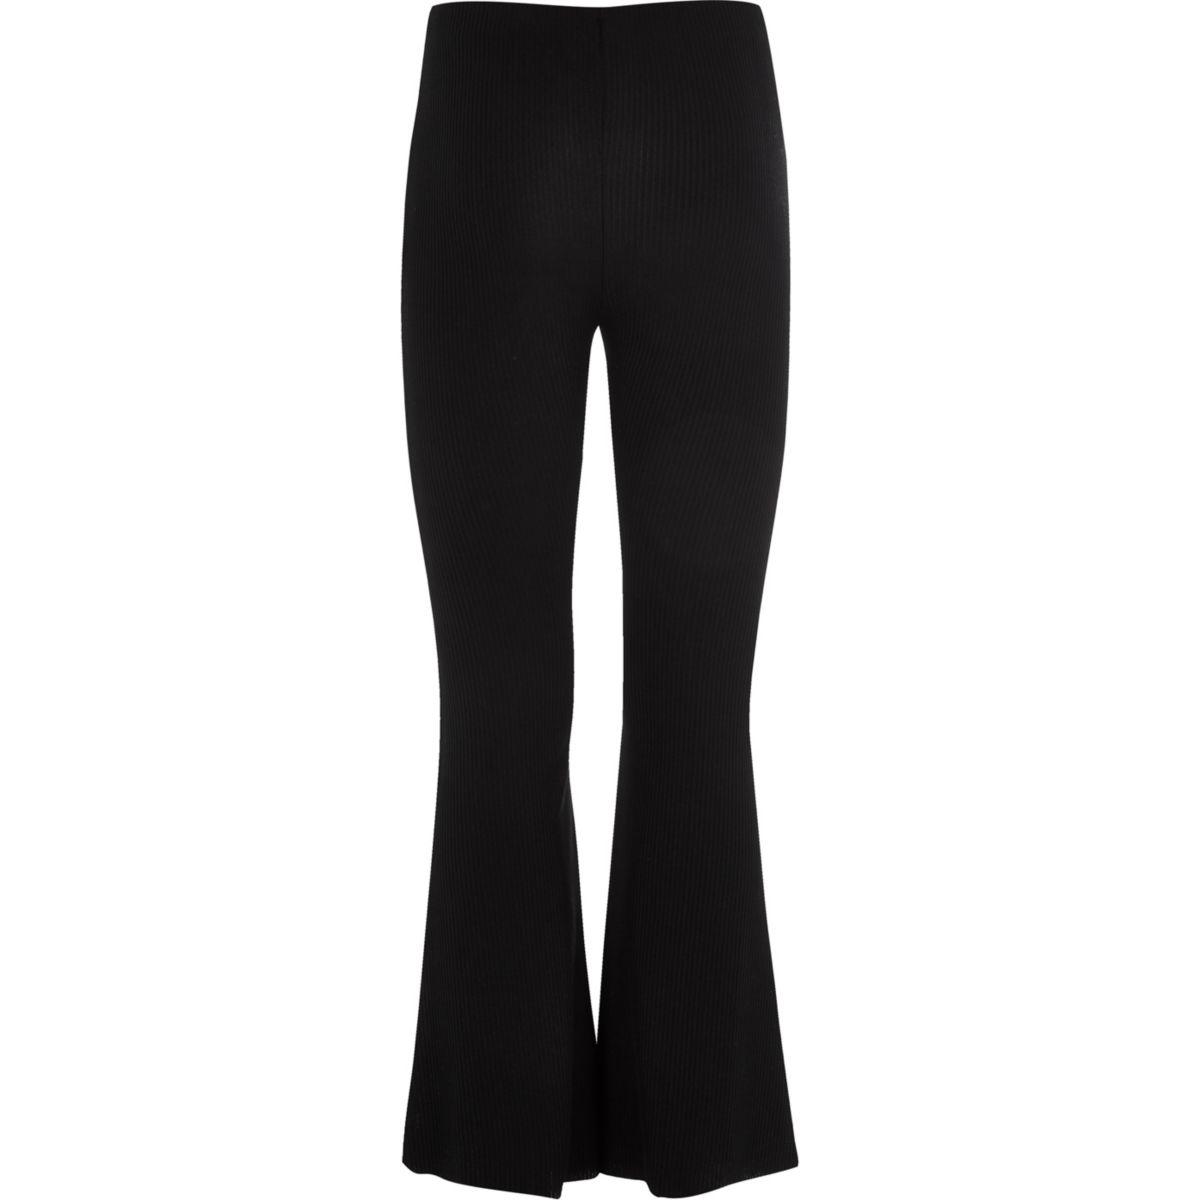 Girls black flared trousers